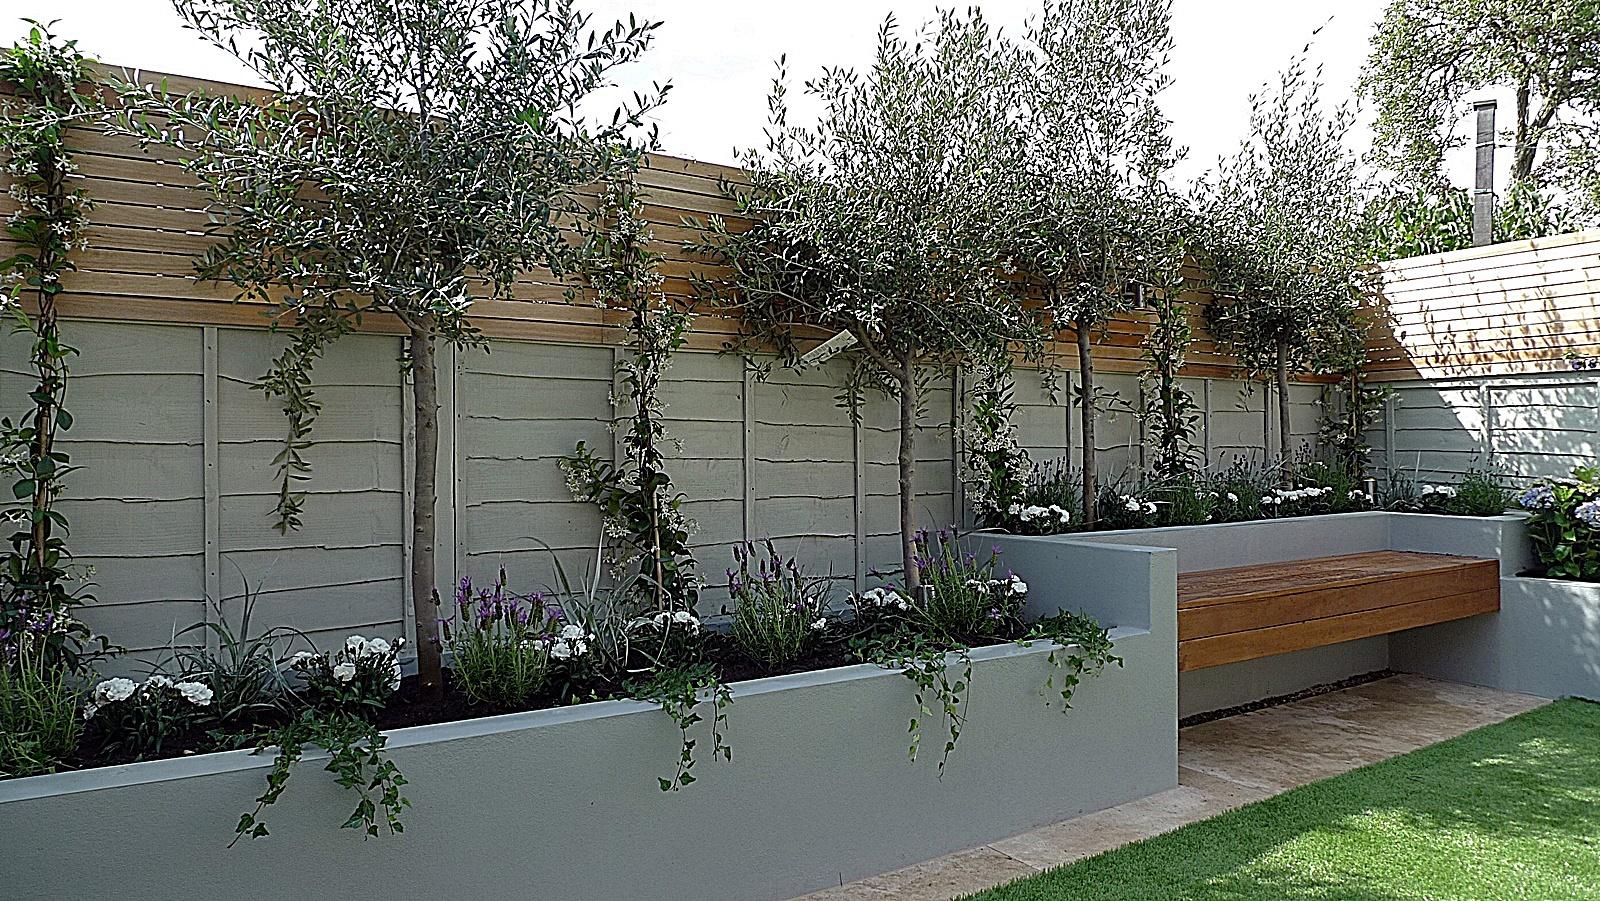 Travertine Paving Raised Beds Hardwood Painted Fence Balham Clapham Dulwich London Garden Design